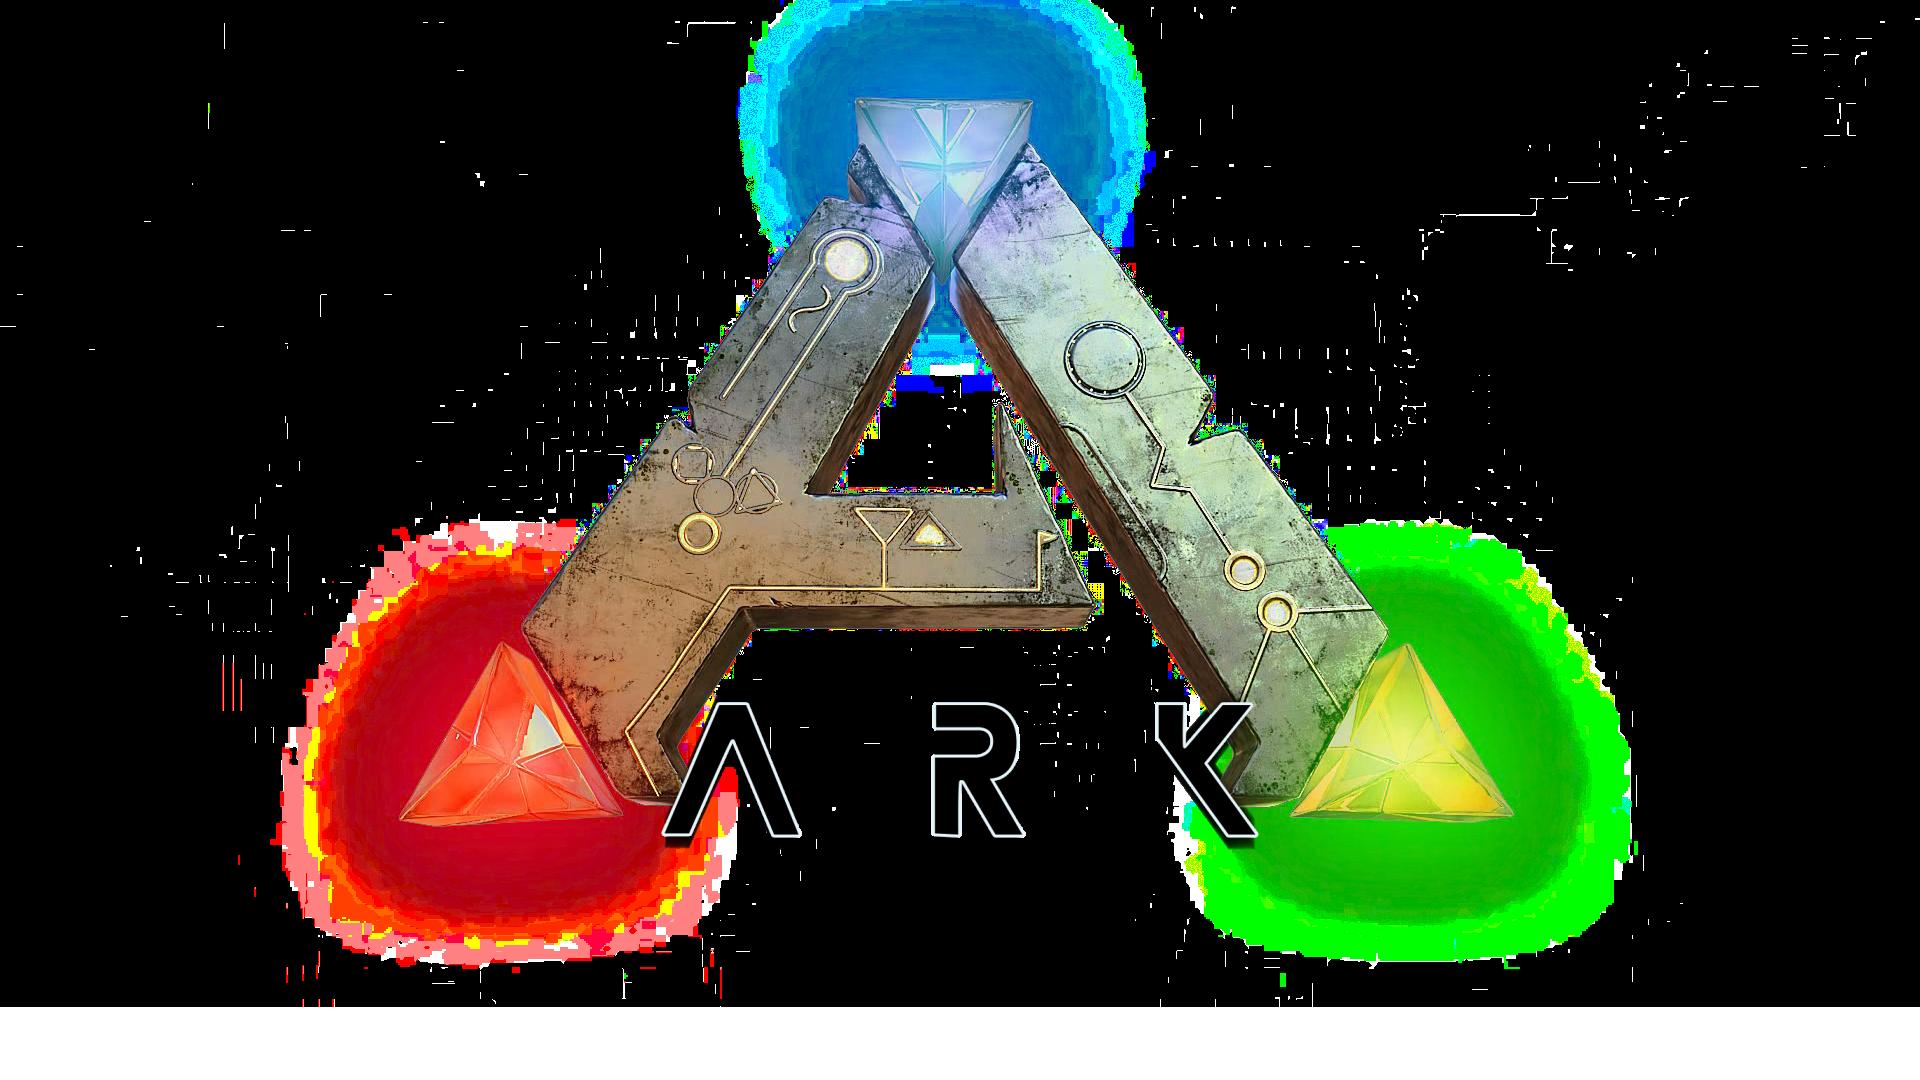 ARK Logo Png image #43969